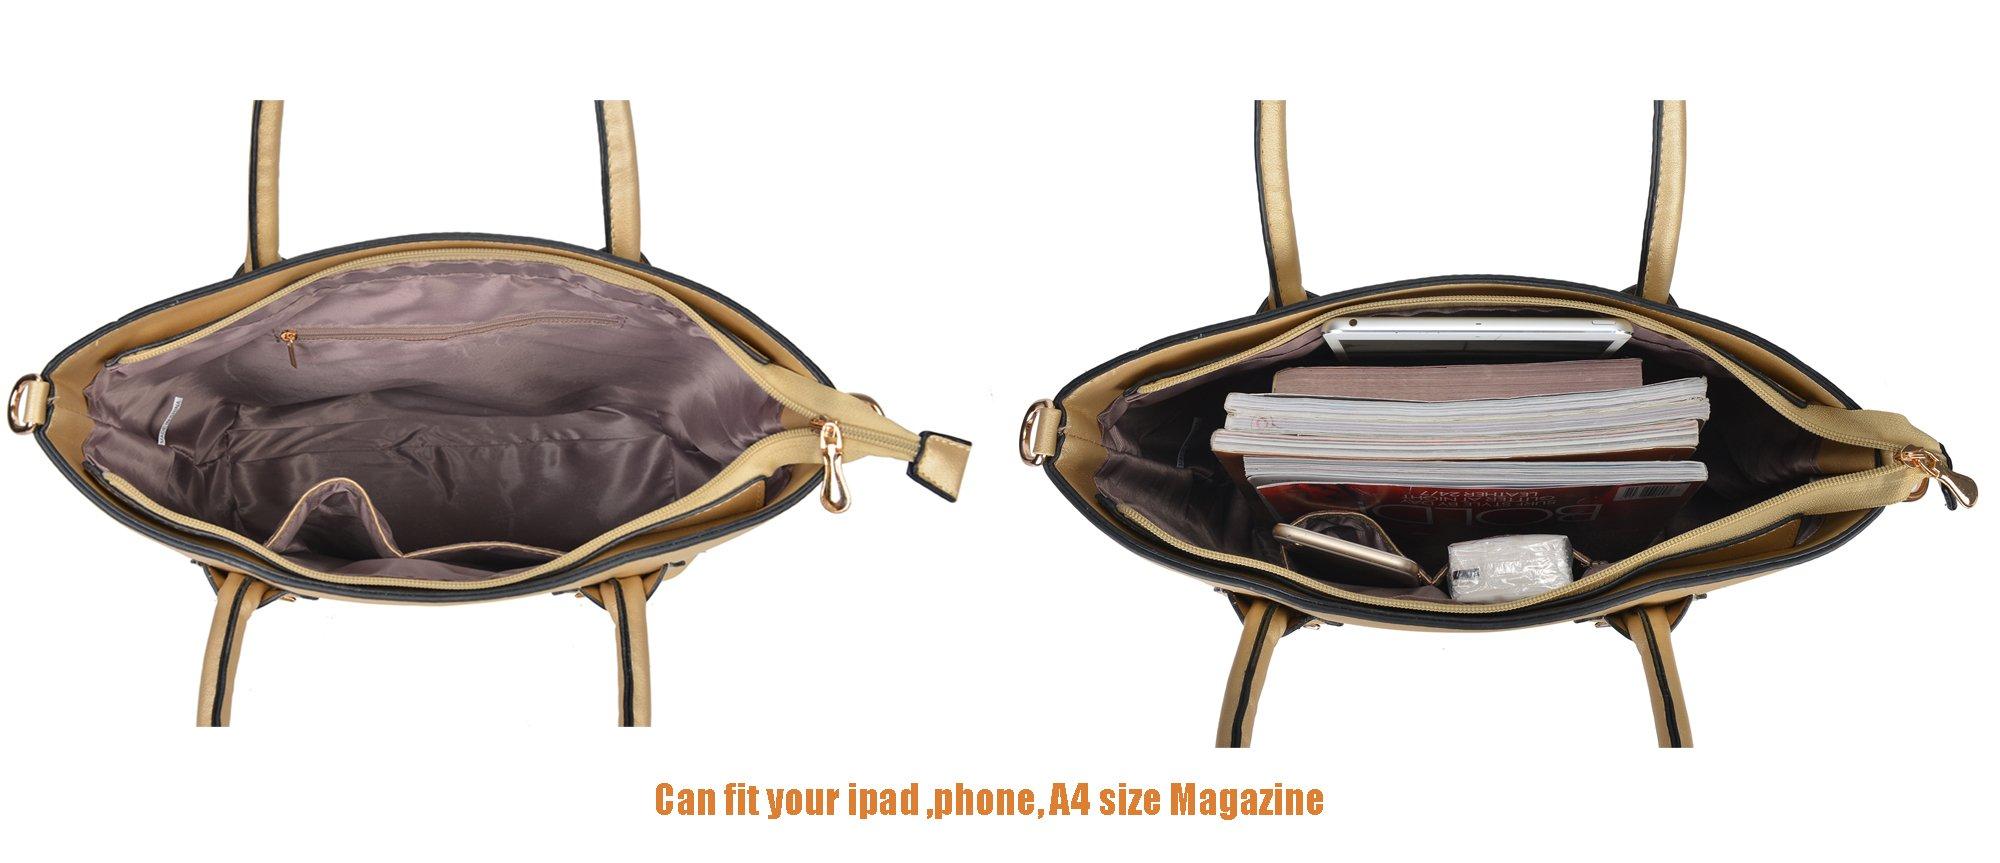 Women Handbag Purse Hobo Faux Leather Messenger Bag Clutch Satchel Bag 3 Piece Gift Set by KasPala (Image #5)